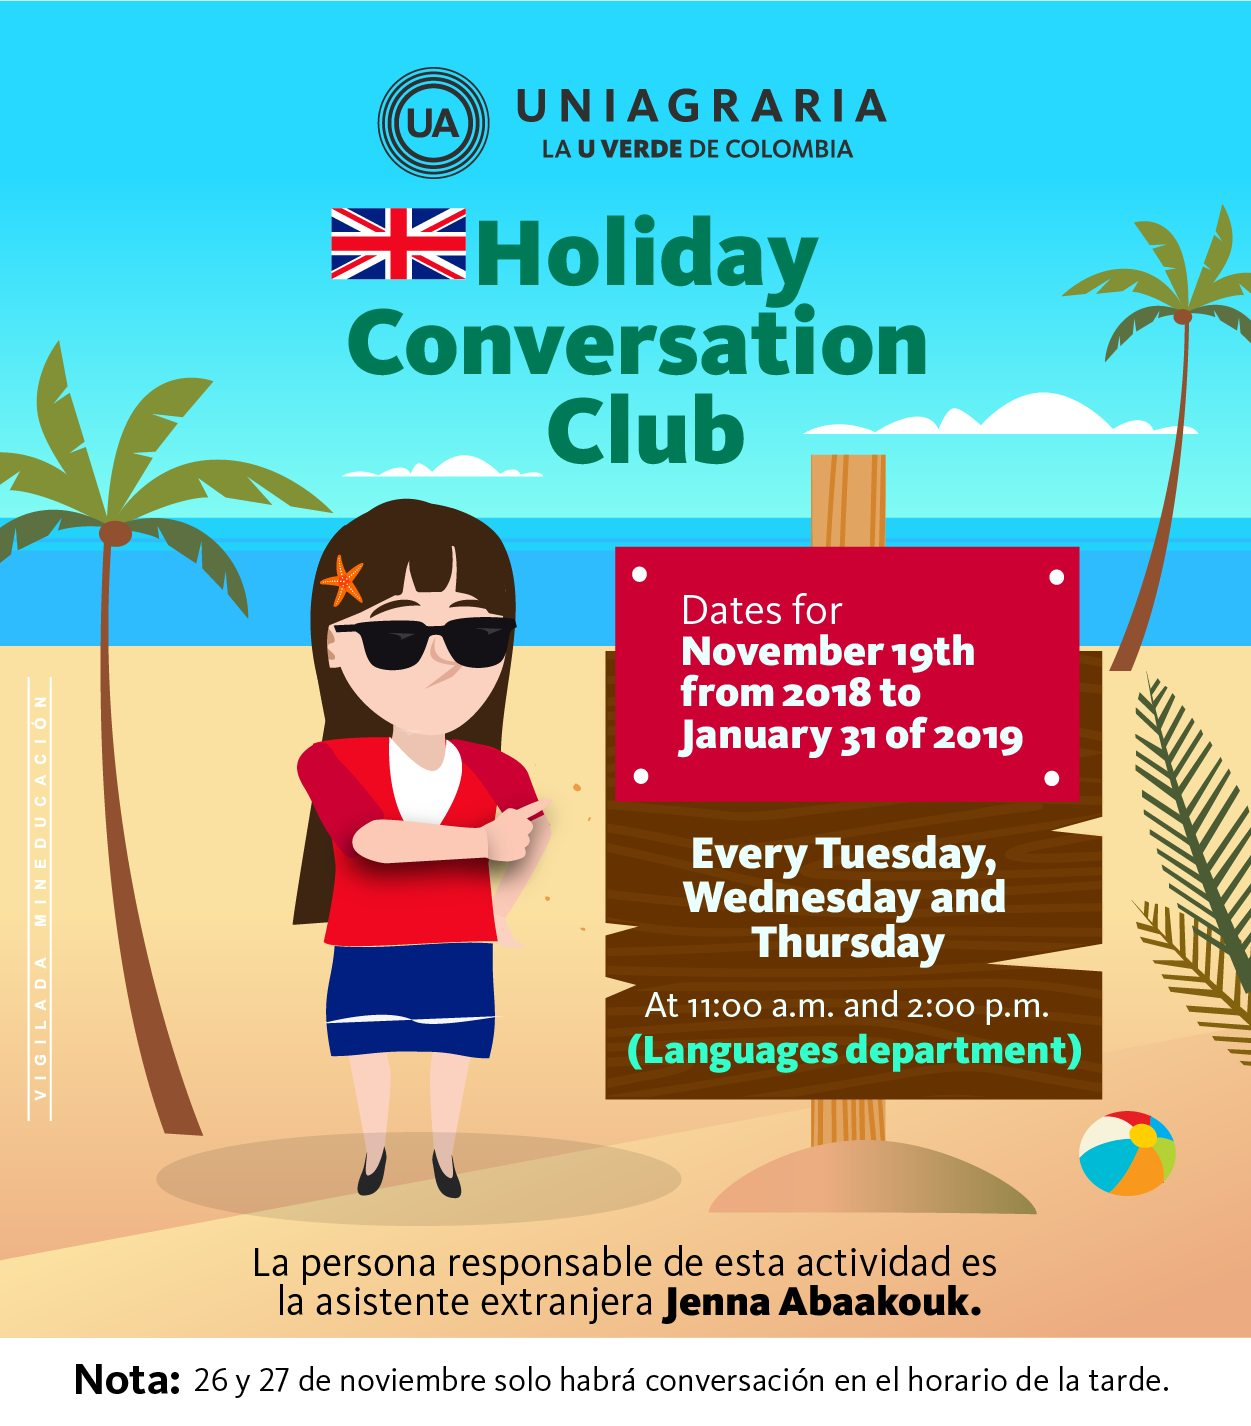 Holiday conversation club